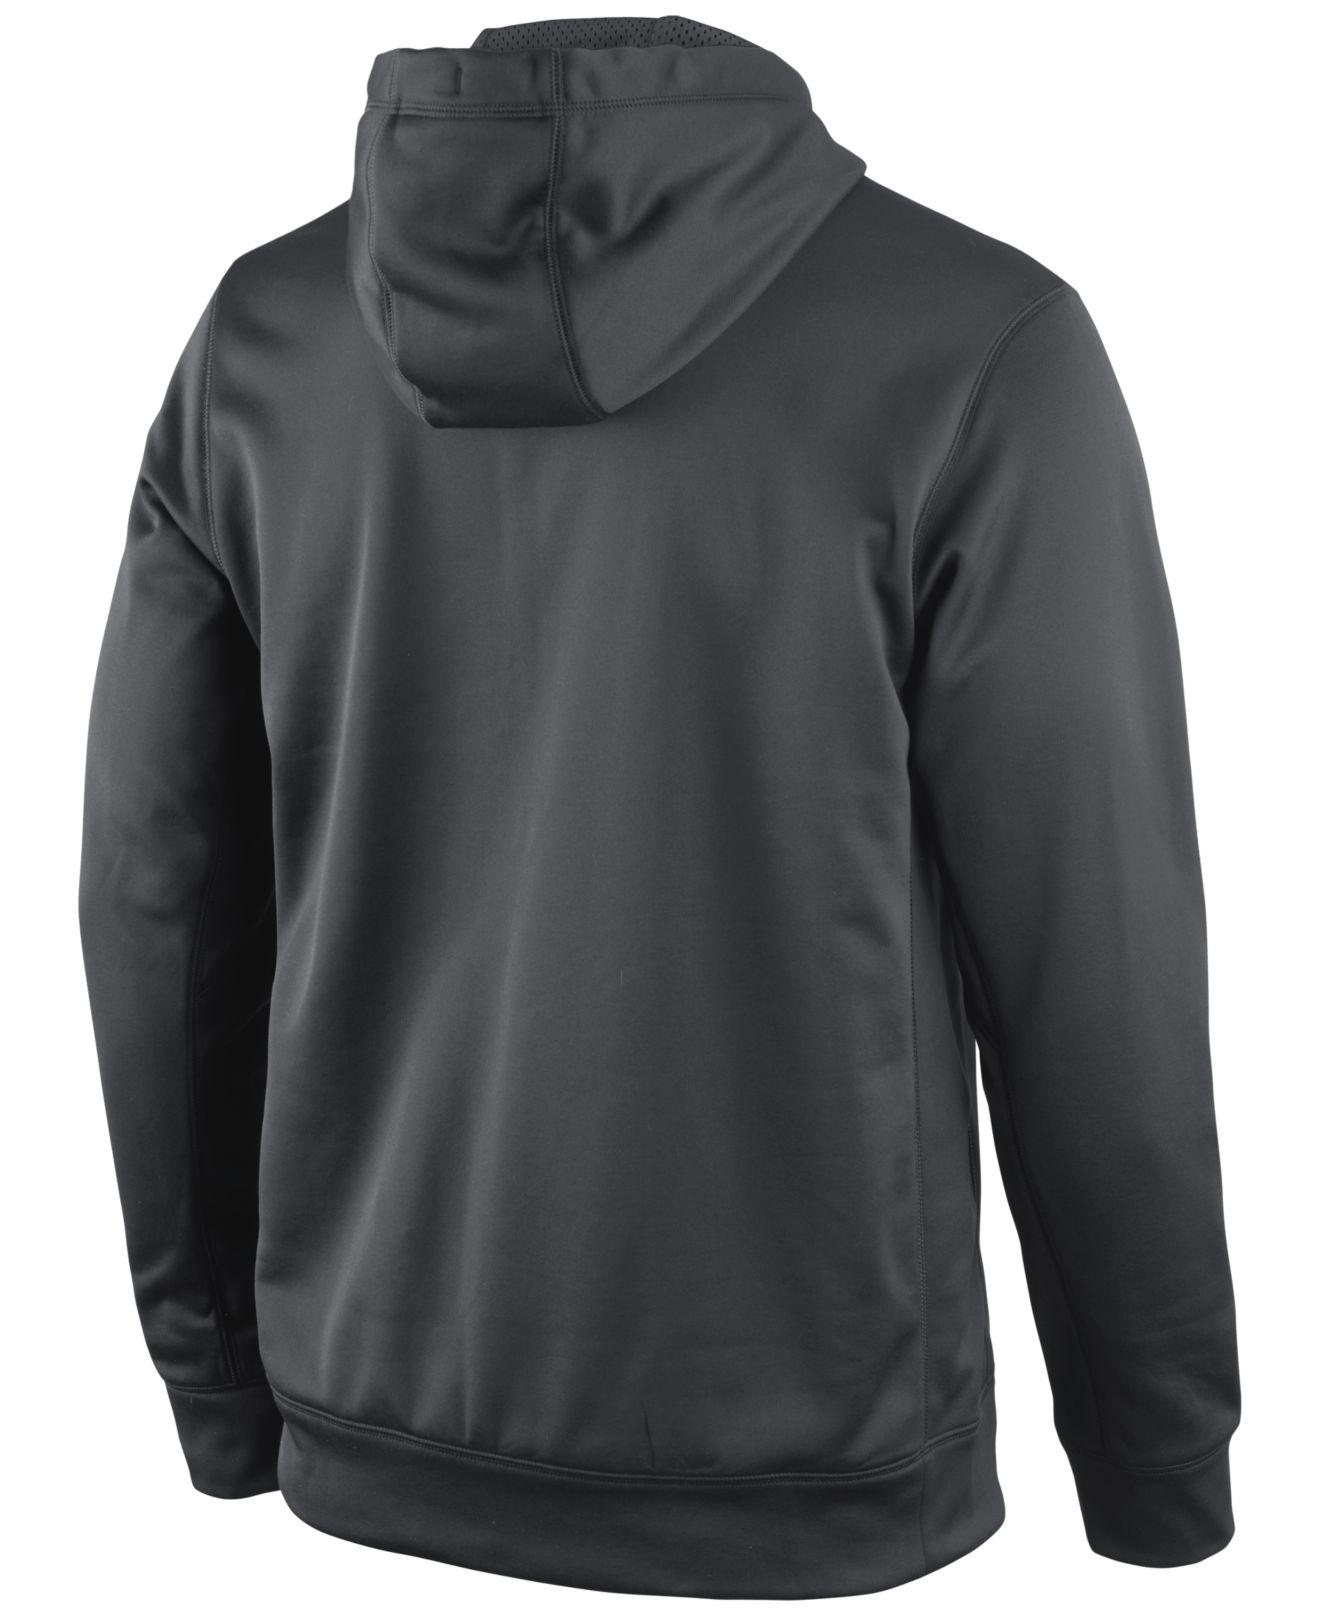 Lyst - Nike Men S Minnesota Vikings Platinum Ko Hoodie in Gray for Men 052e9270a